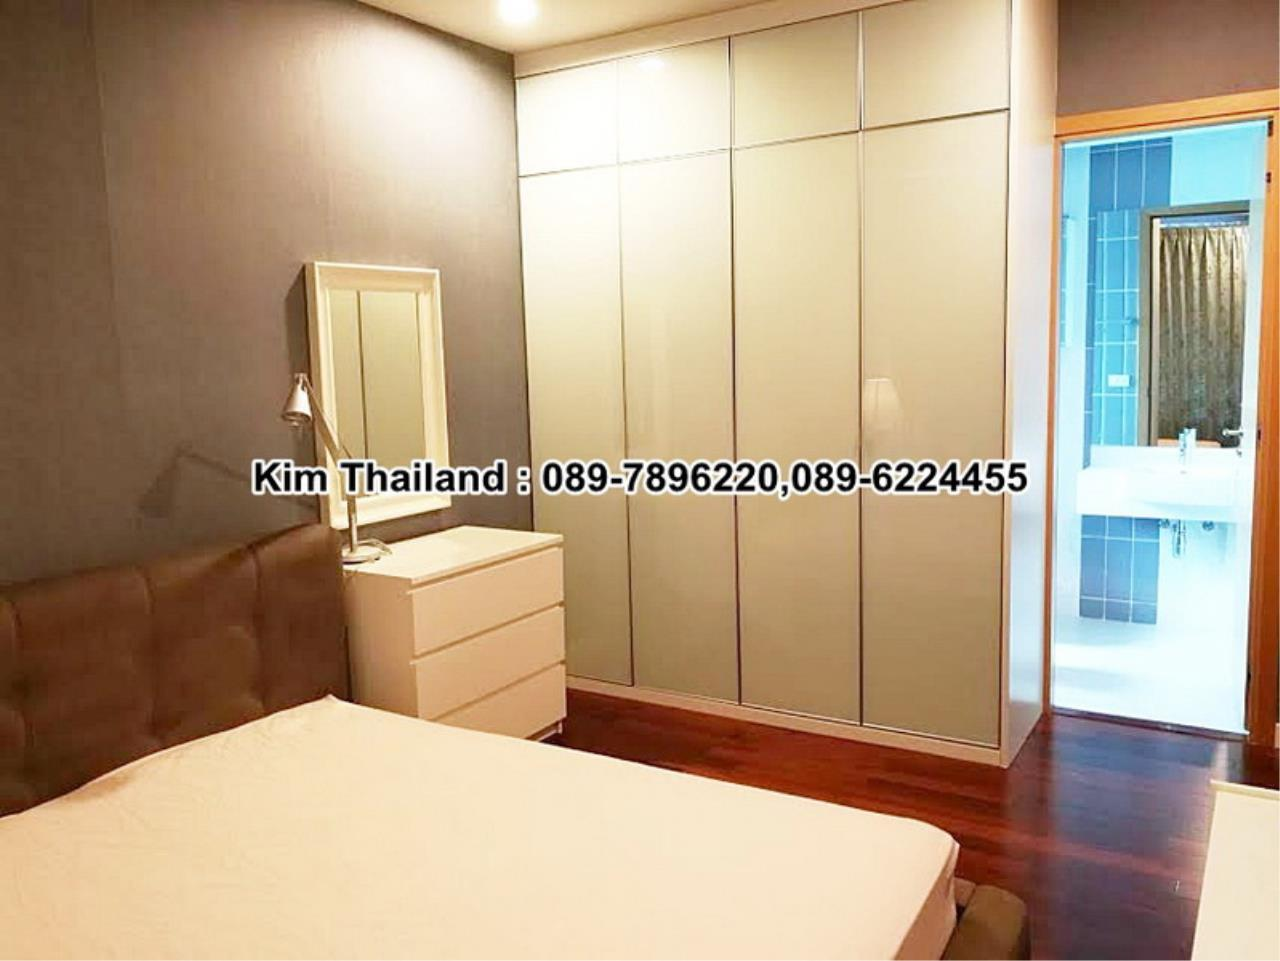 BKKcondorental Agency's For rent, Circle Condominium.  Area 76 sq.m. 2 bedrooms. Rental 35000THB/month. 2